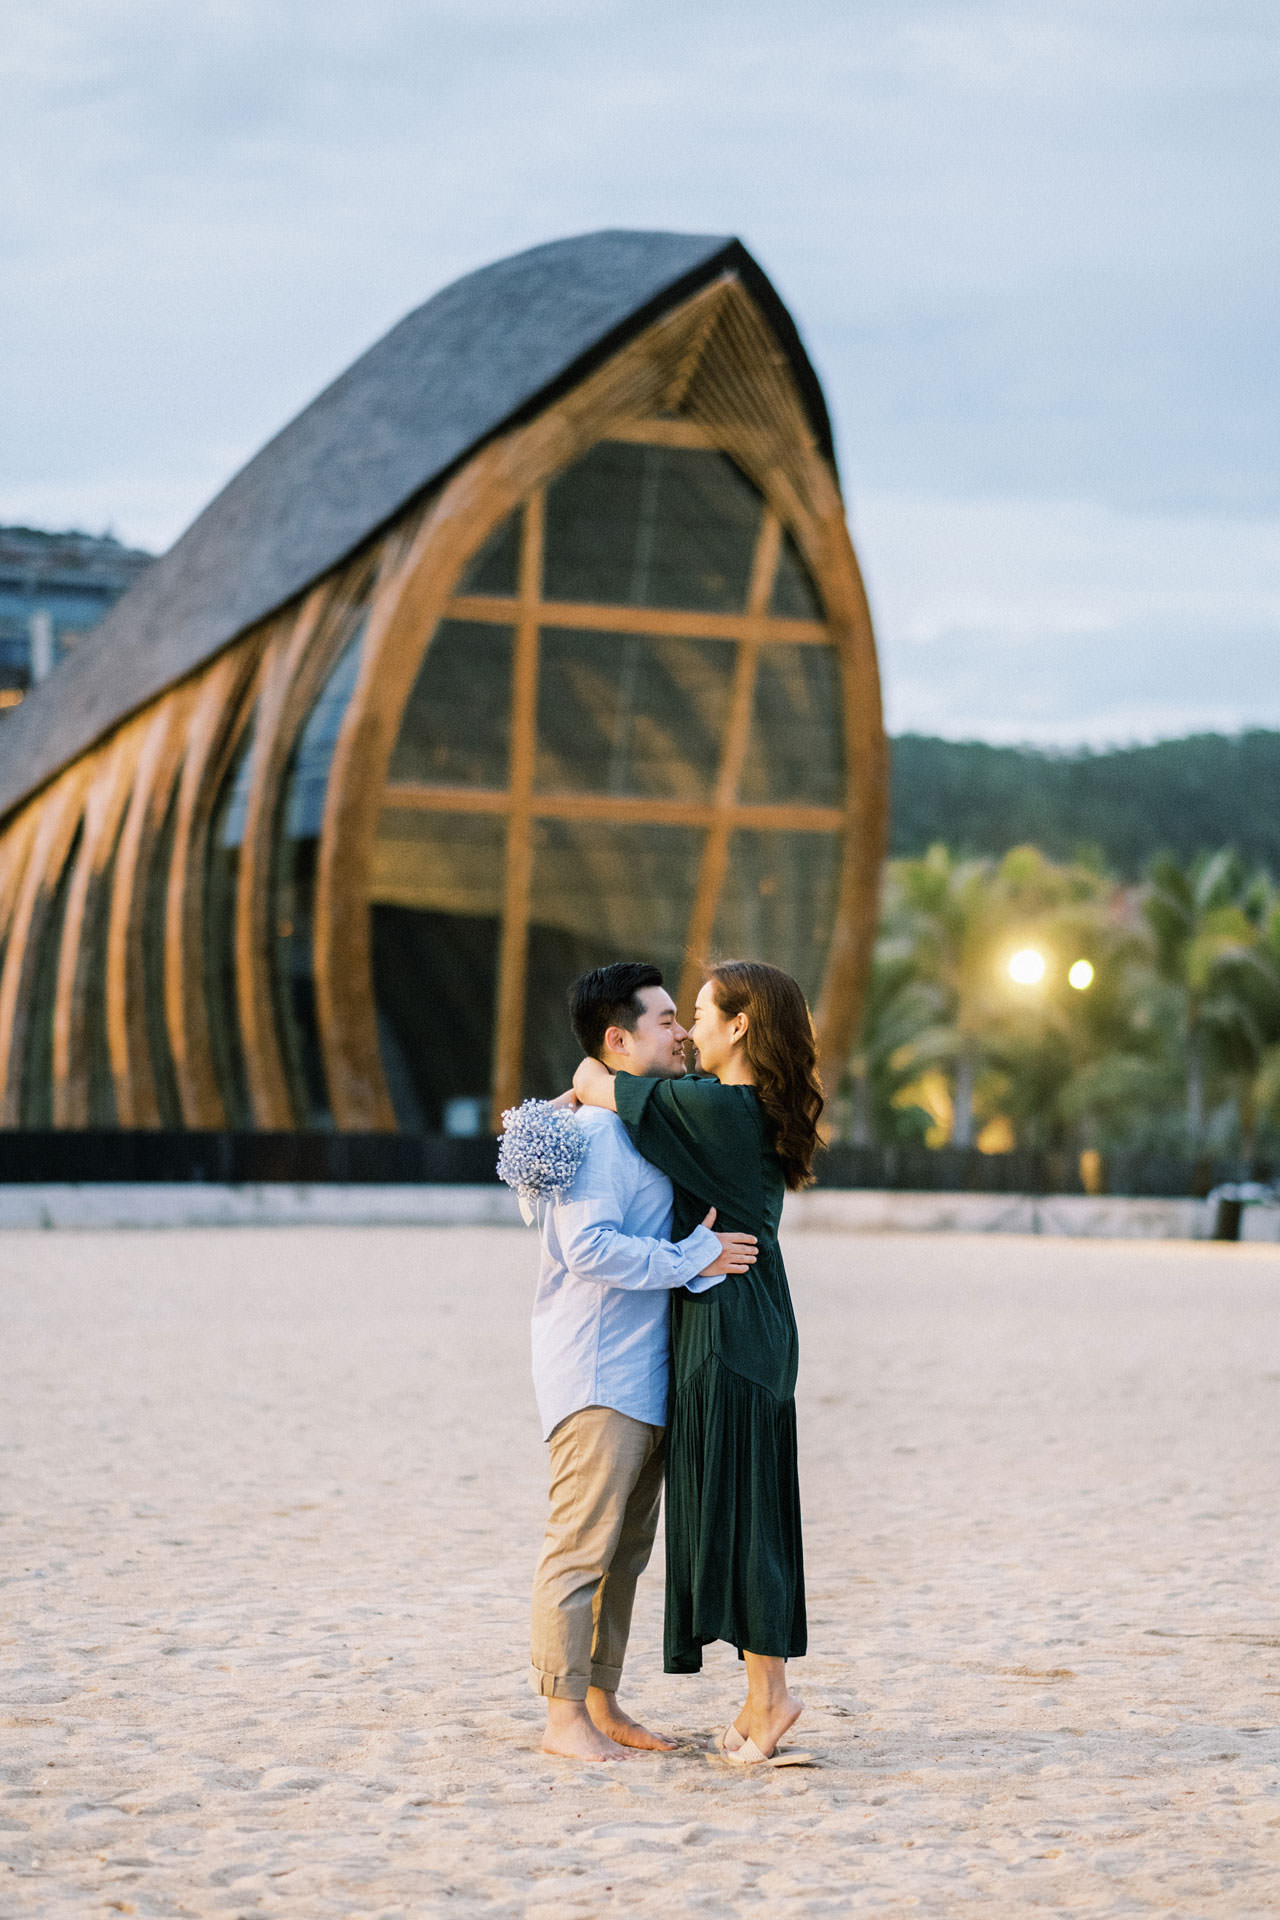 Apurva Kempinski Bali Proposal Photography 30